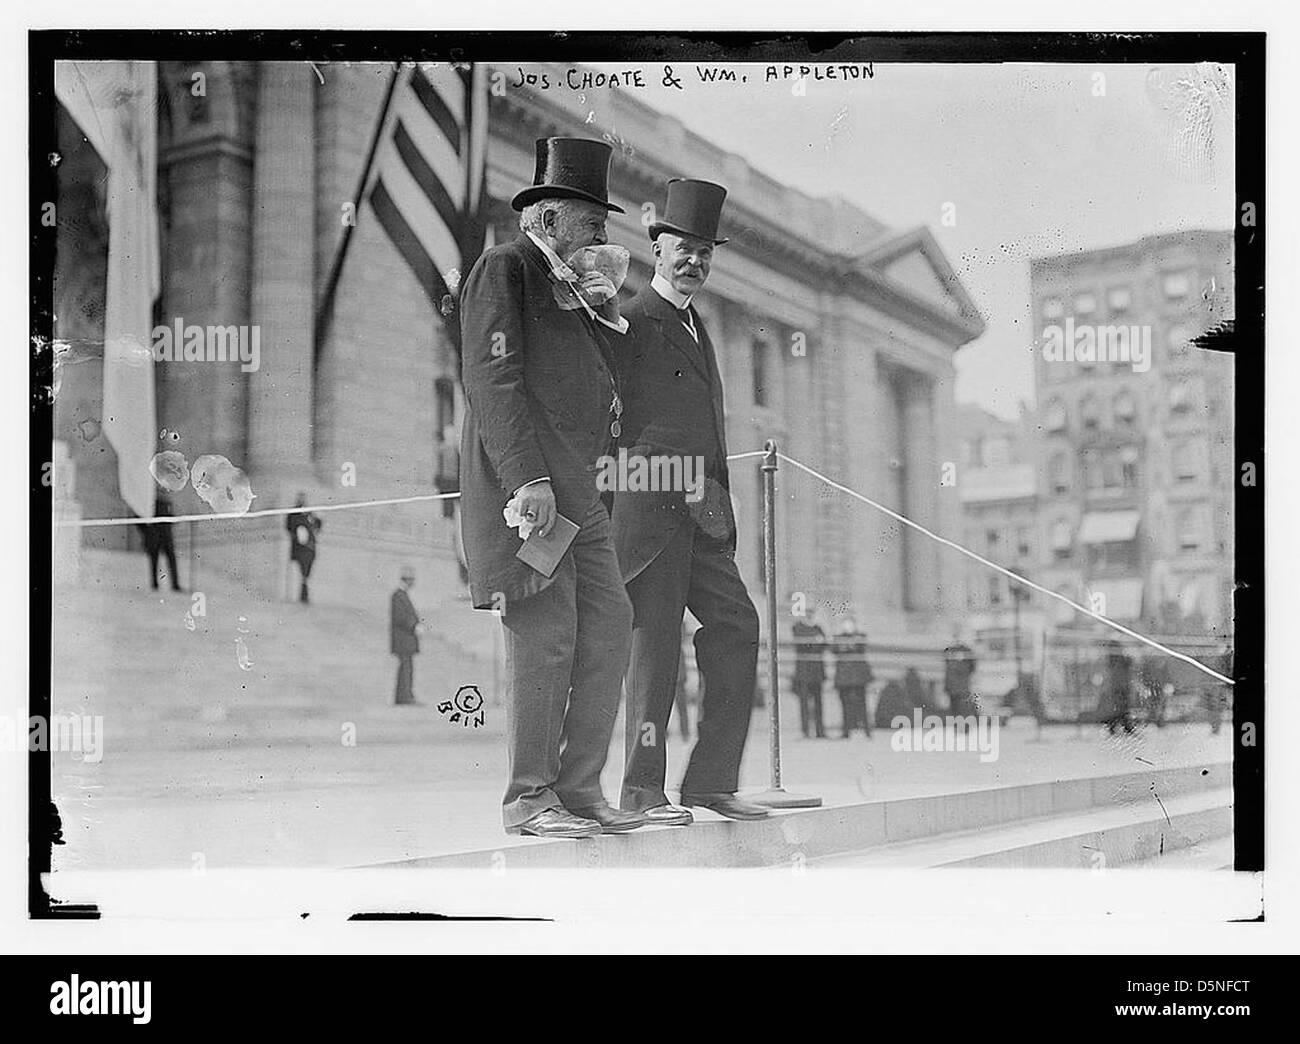 Jos. Choate & Wm. Appleton (LOC) - Stock Image